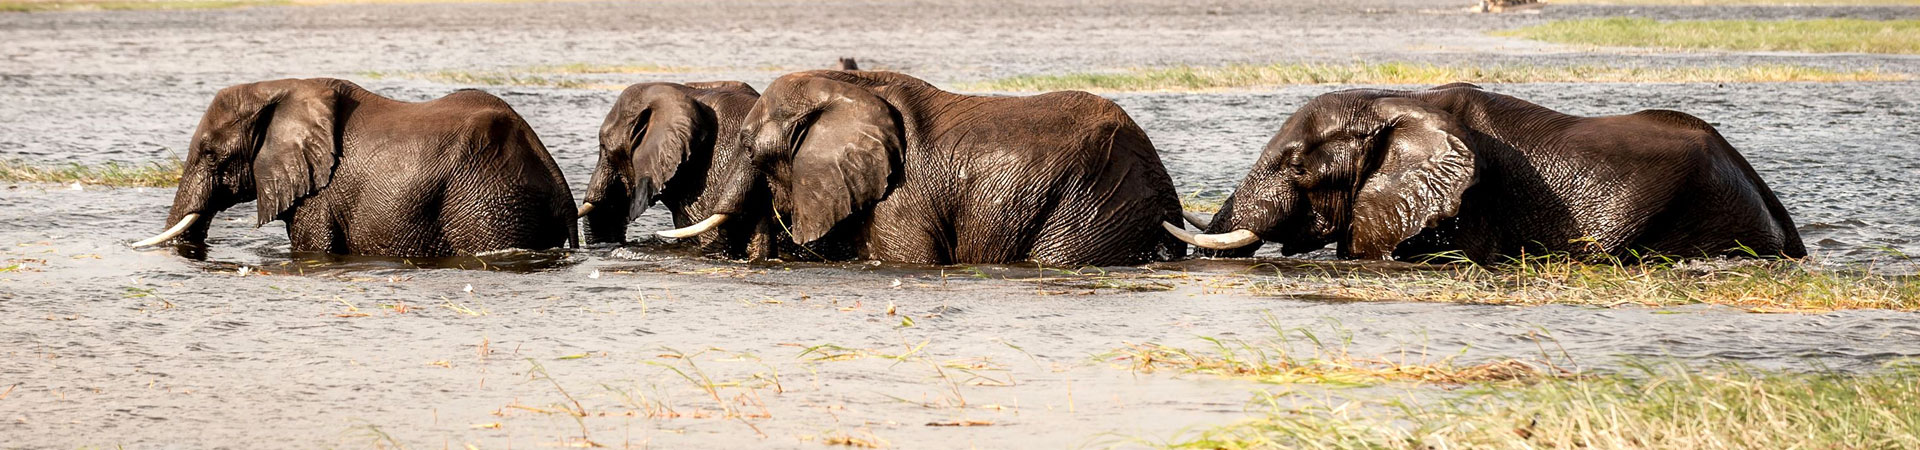 12-Days-Kenya-family-safaris-and-beach